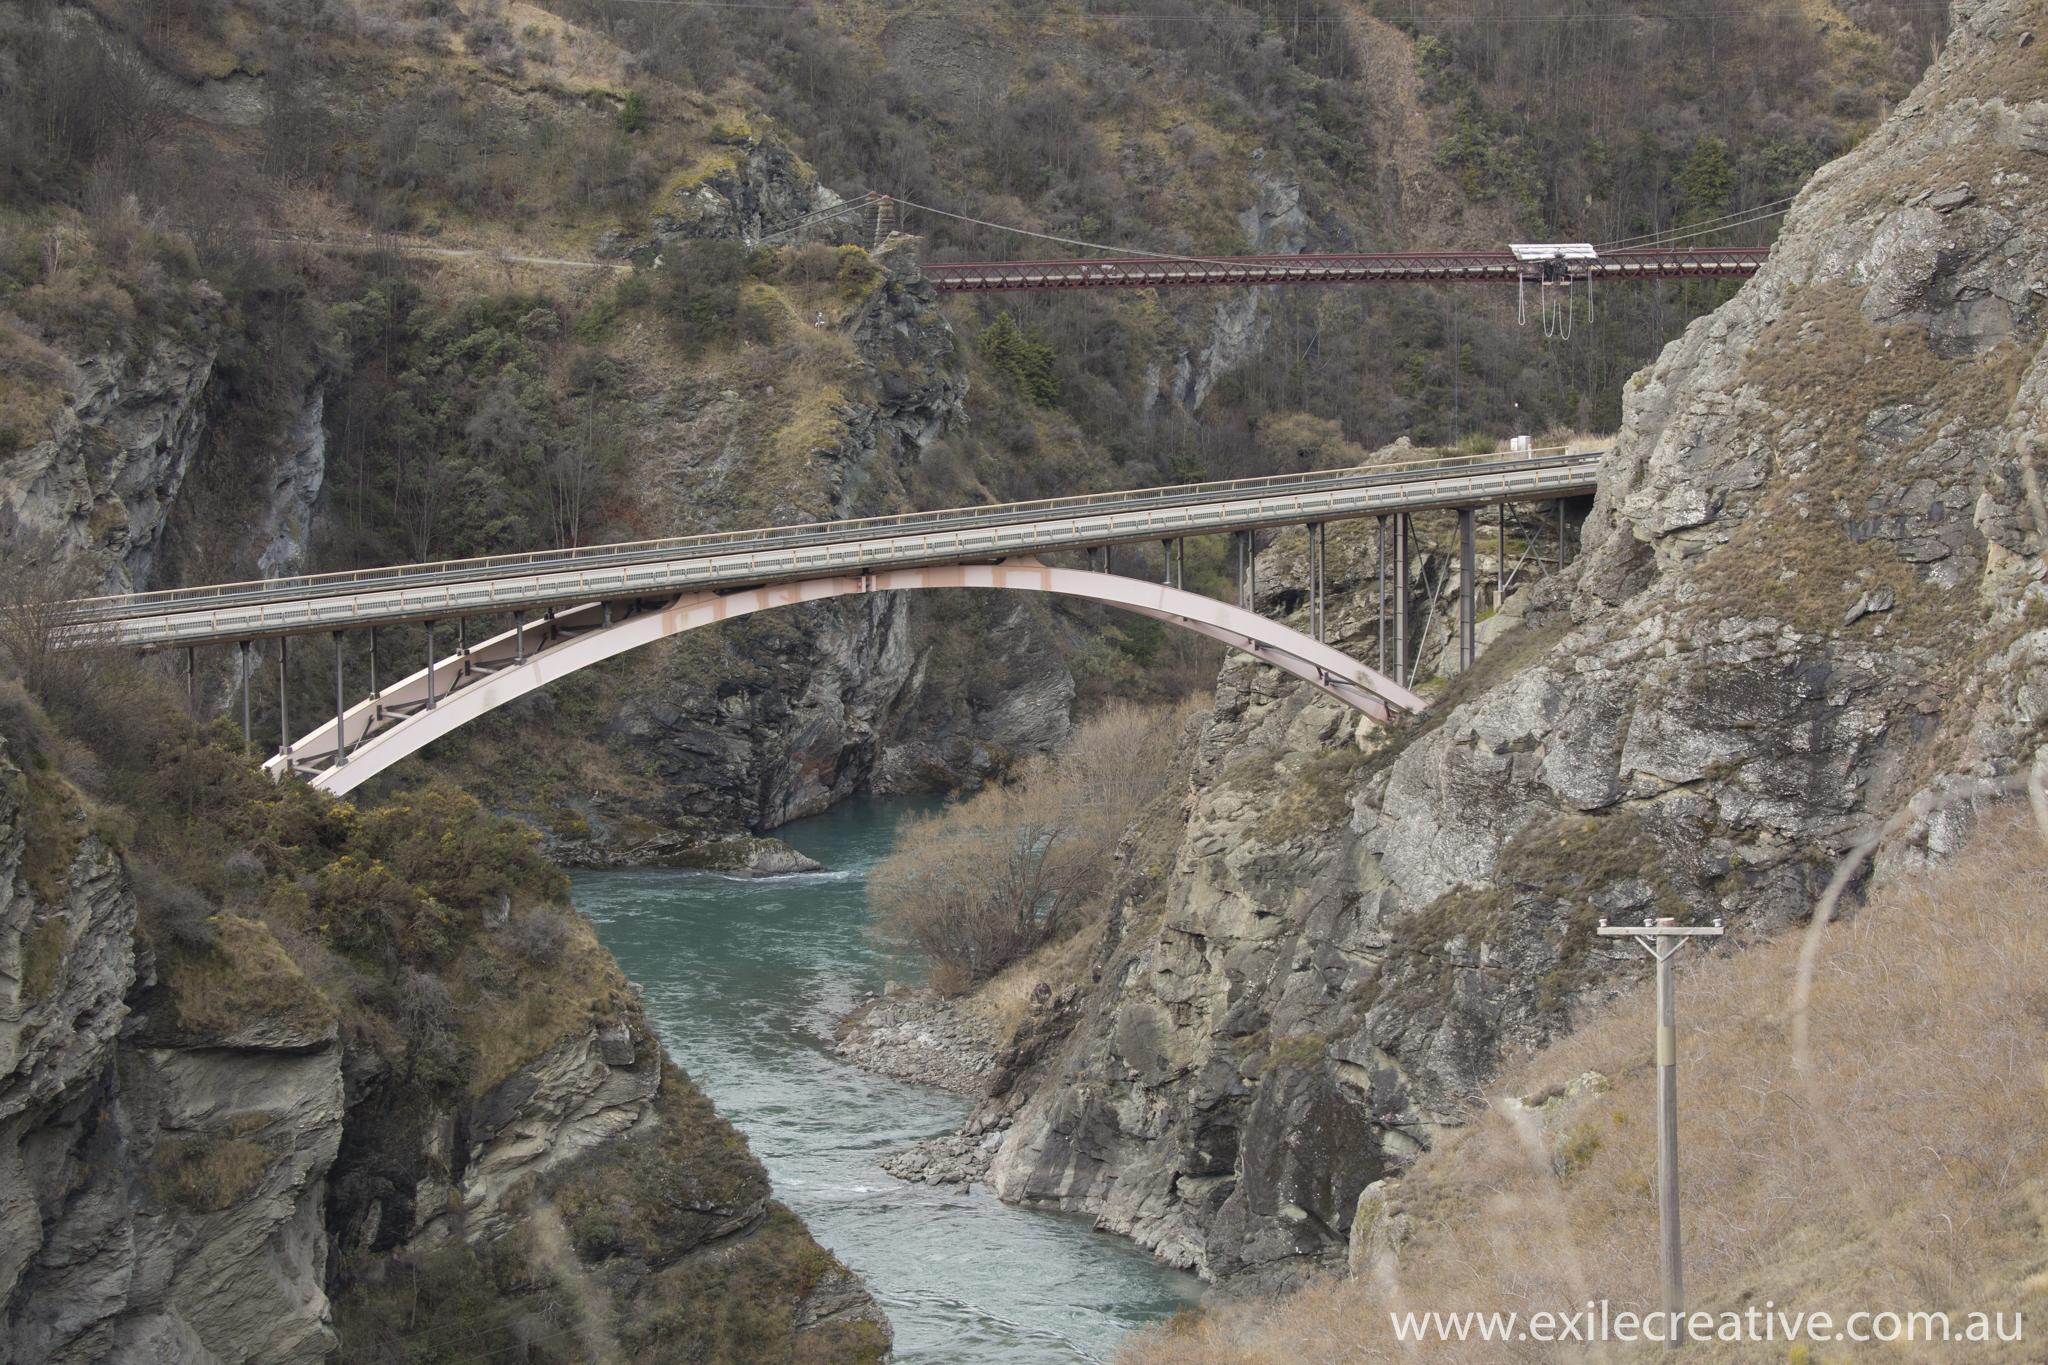 Kawarau Gorge Suspension Bridge  Canon 5Dmiii, 100-400L II IS @ 400mm, ISO400, f/6.3, 1/250s